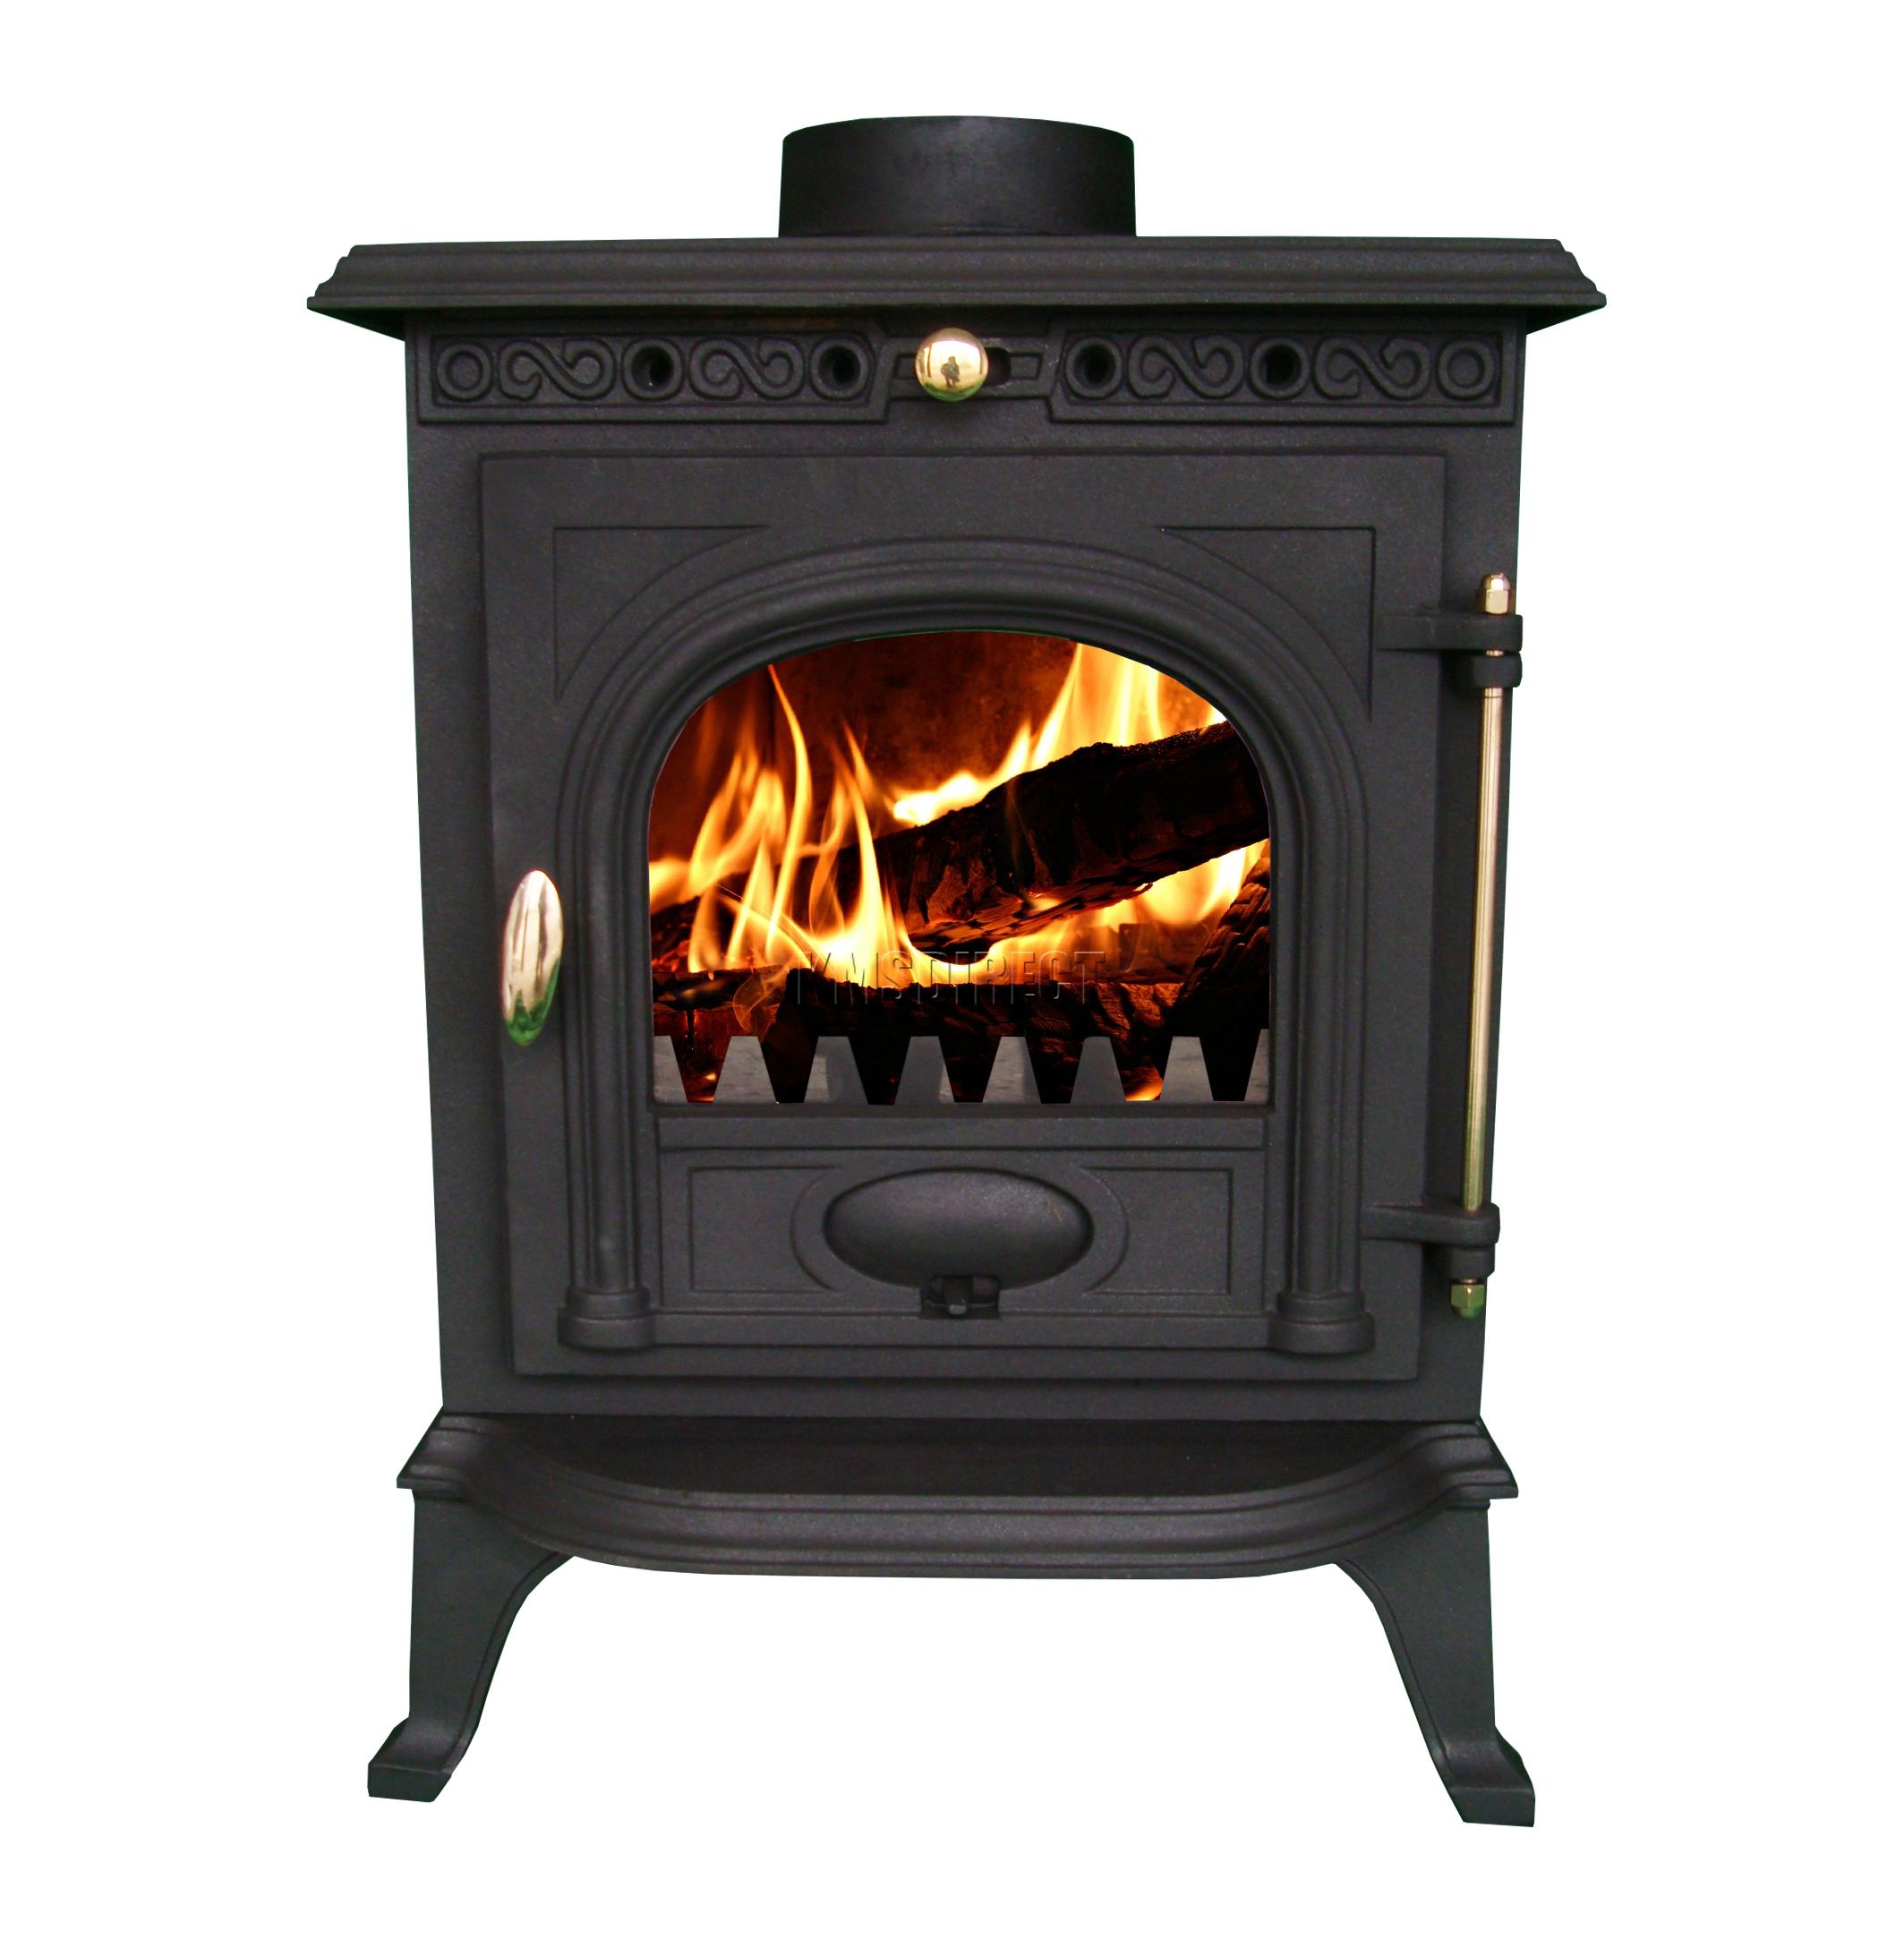 Multi Fuel Burner Reviews: WoodBurner NEW Cast Iron Log Burner MultiFuel Wood Burning